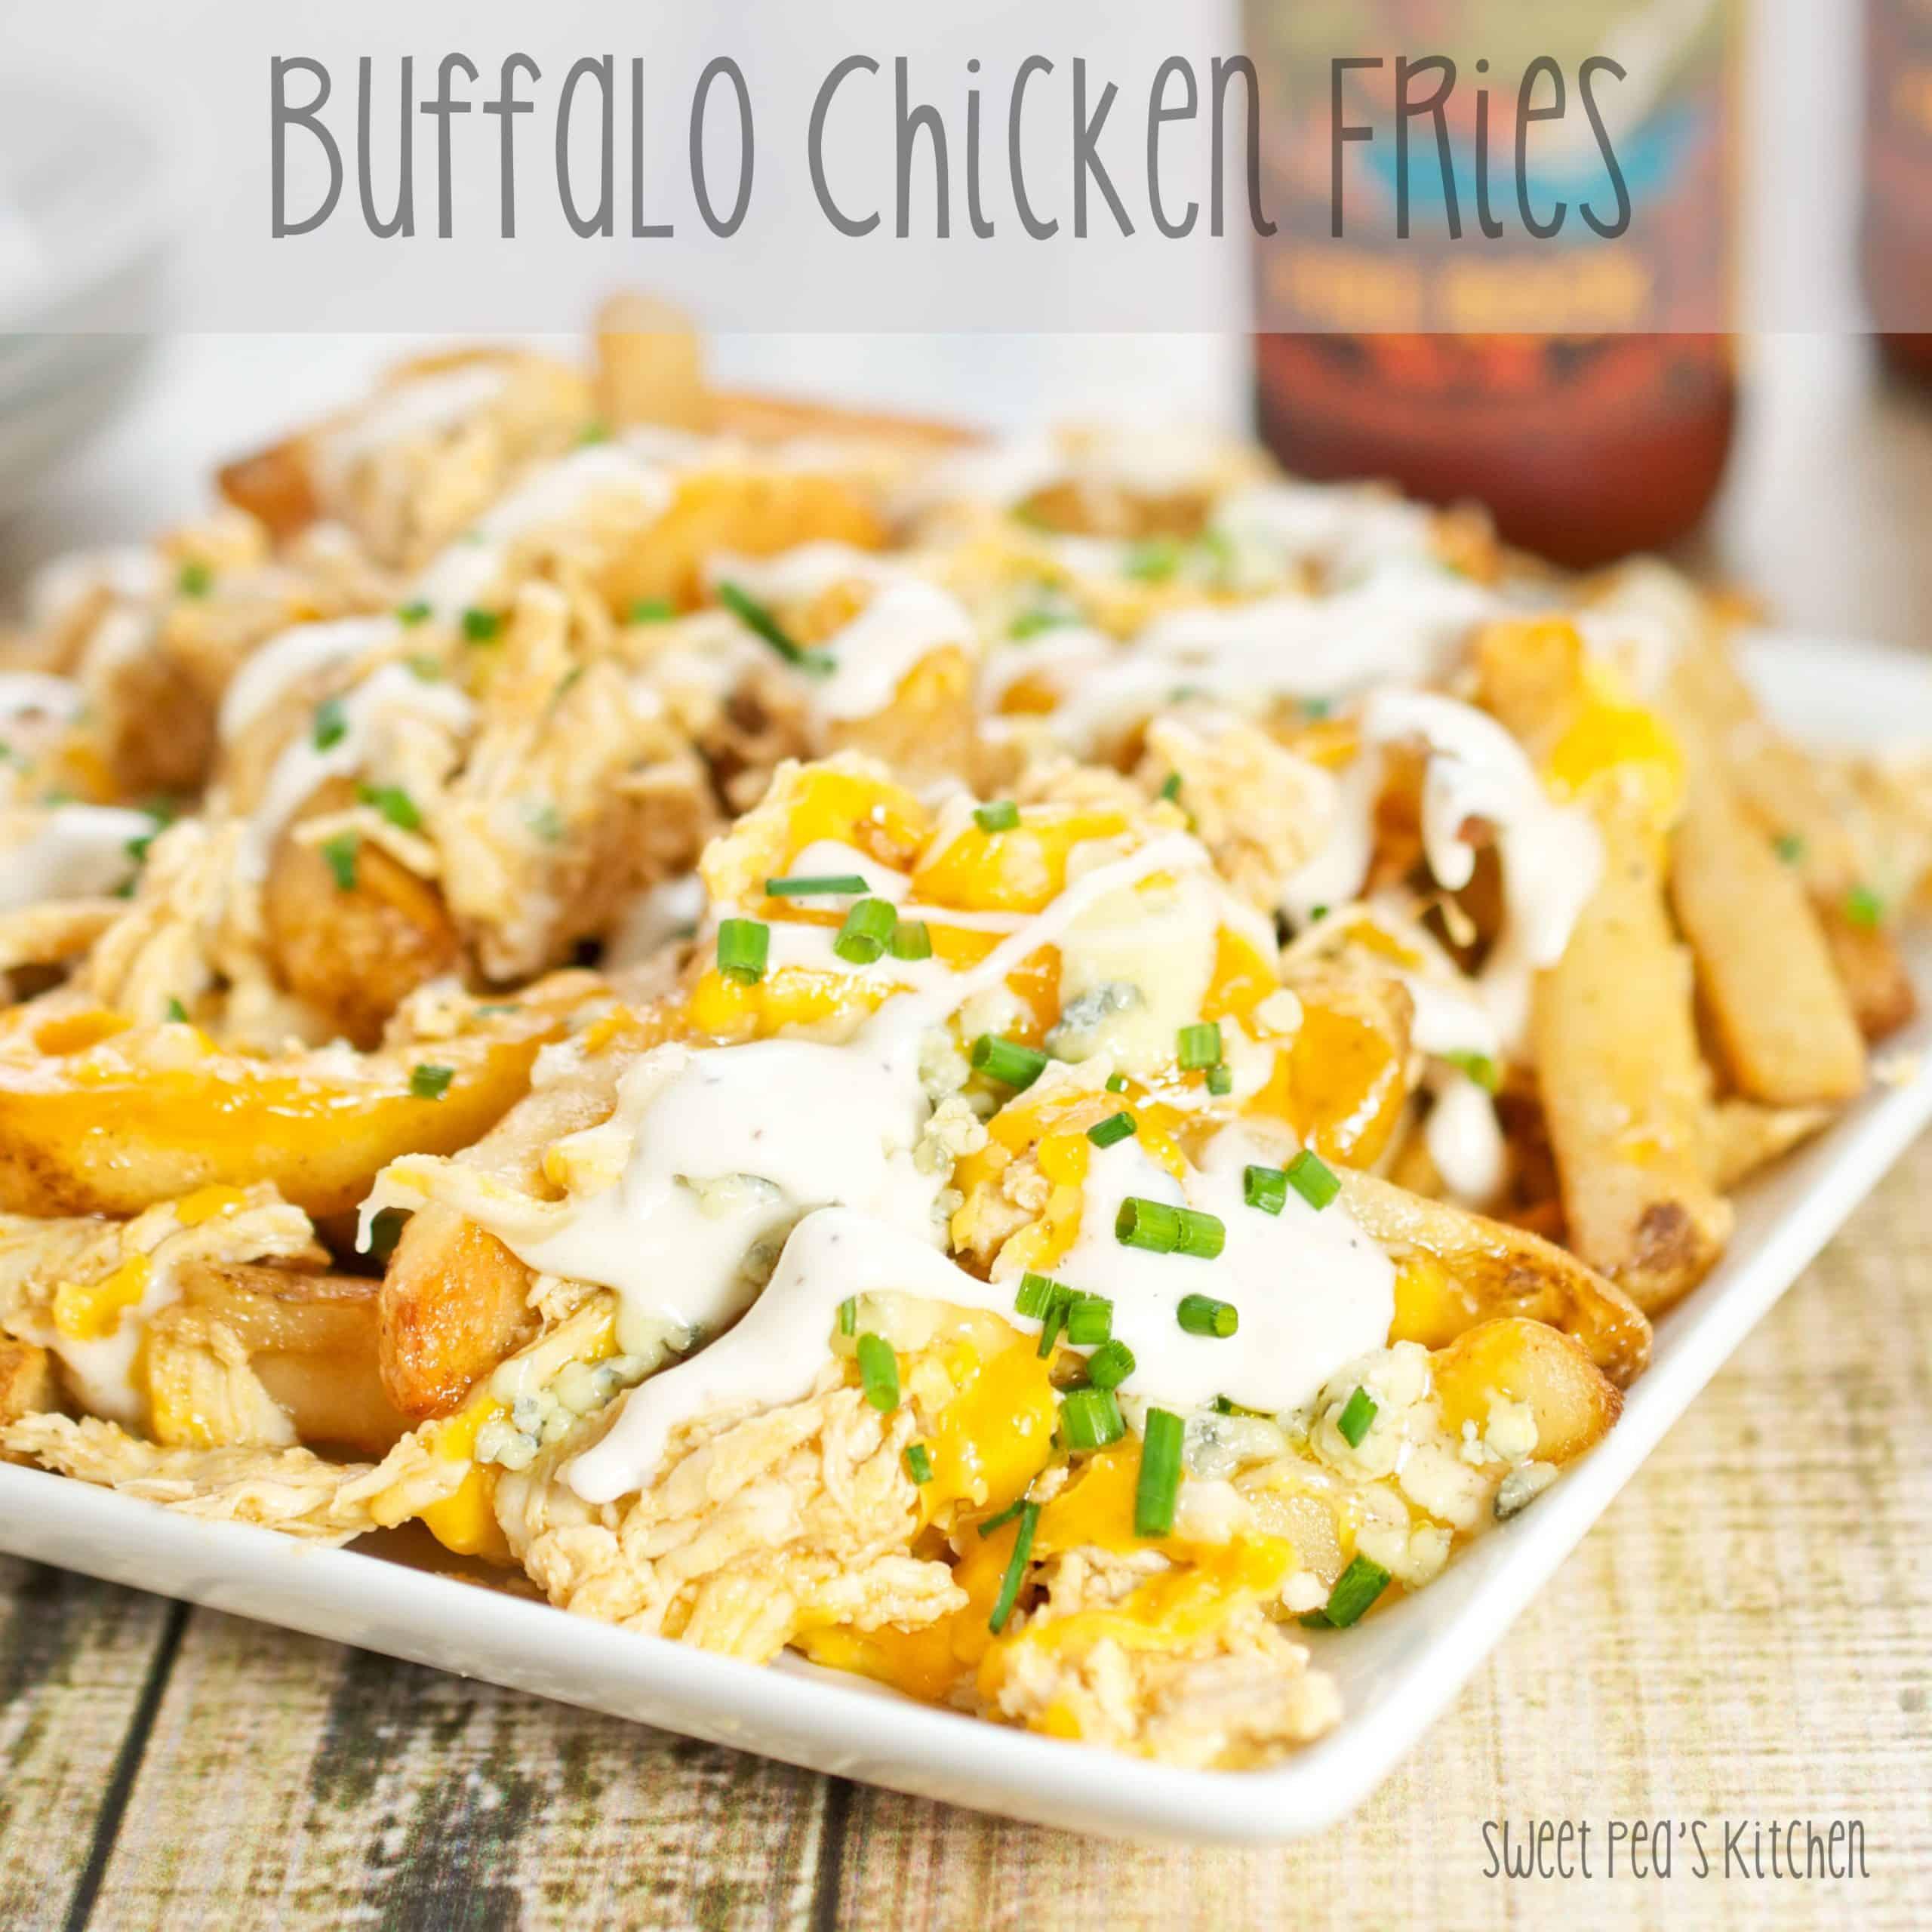 sheet pan of Loaded Buffalo Chicken Fries